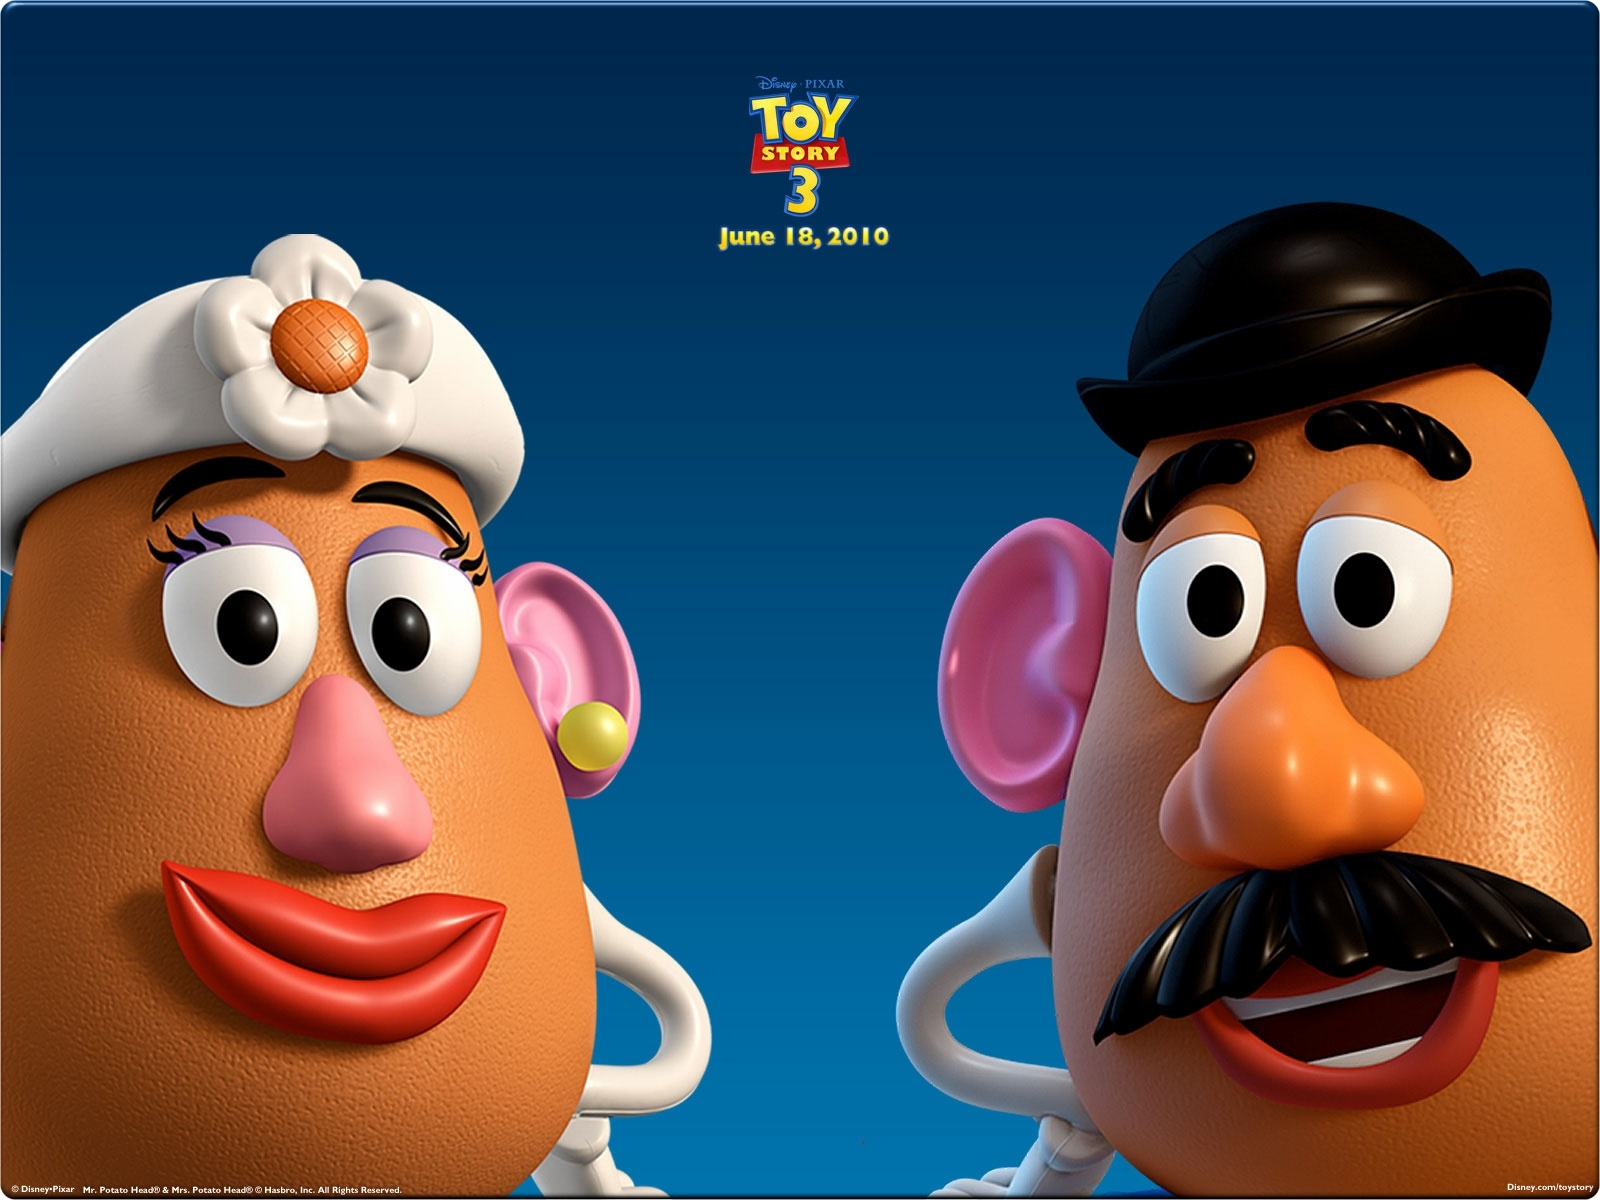 toy story 3 wallpaper potato head